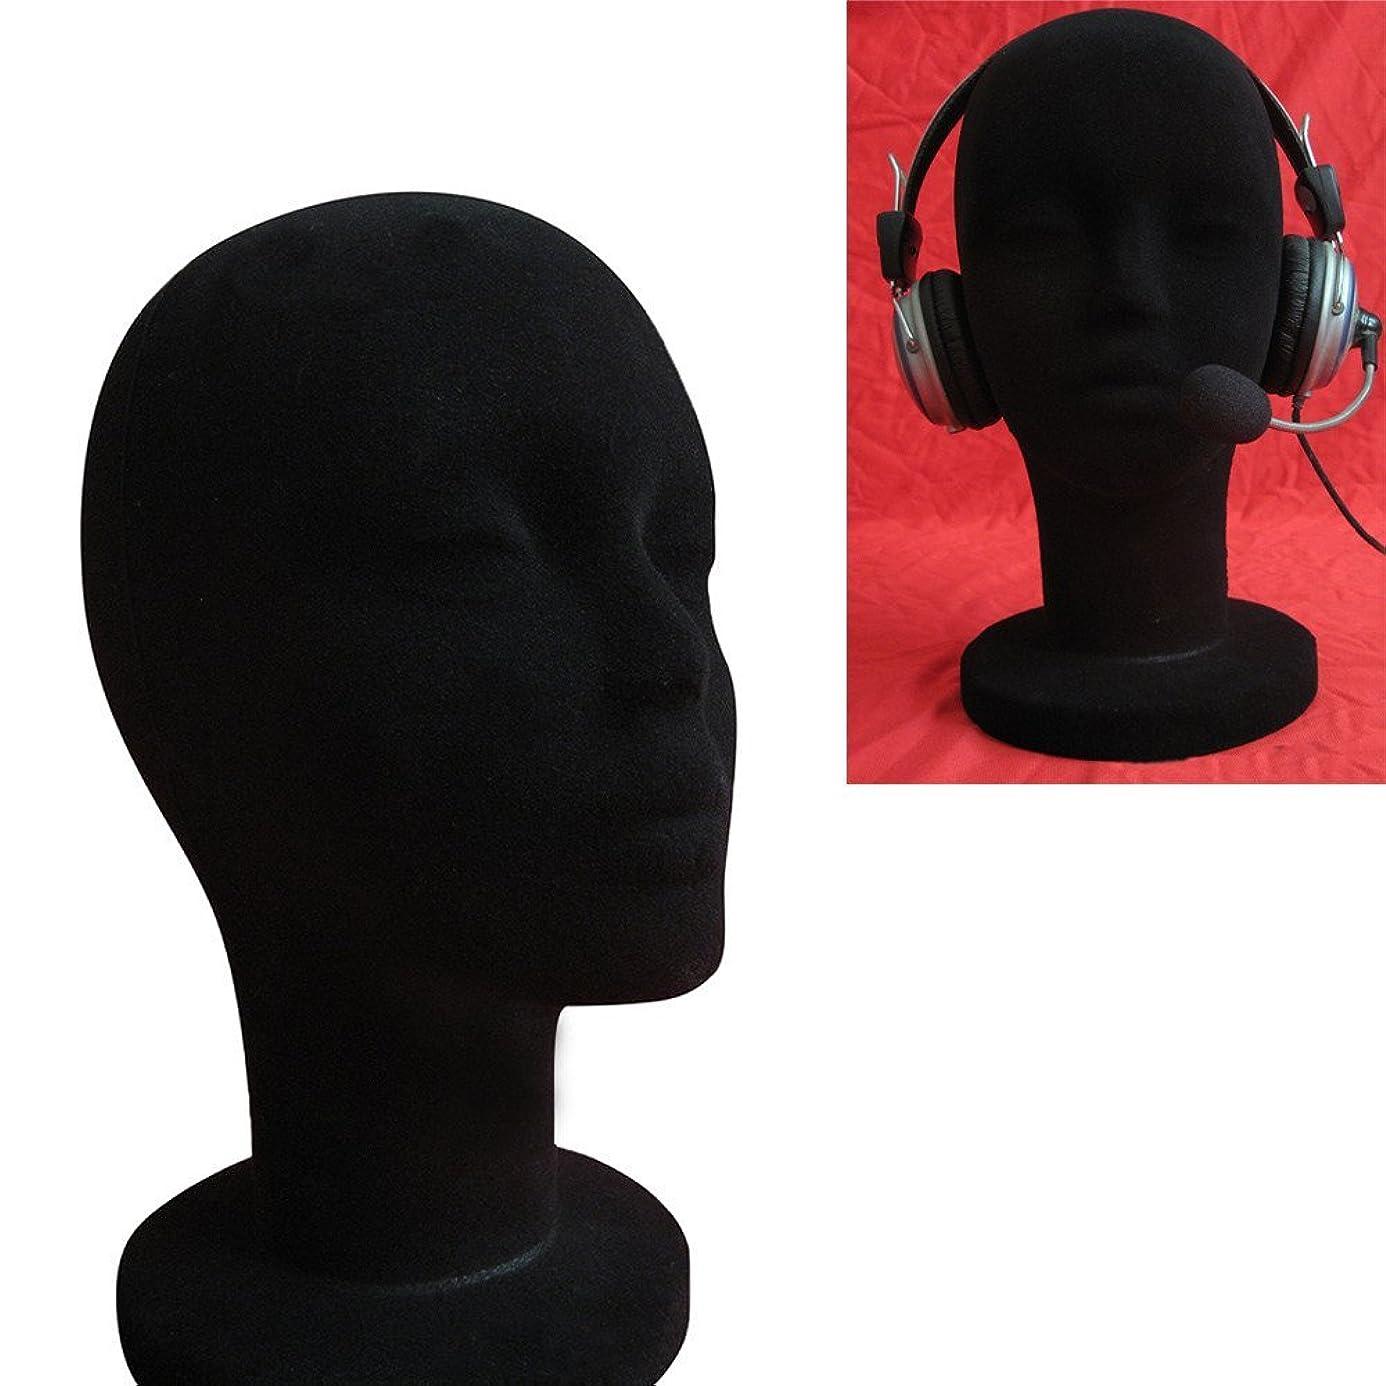 ??Jonerytime??Female Styrofoam Foam Flocking Head Model Wig Glasses Display Stand Black